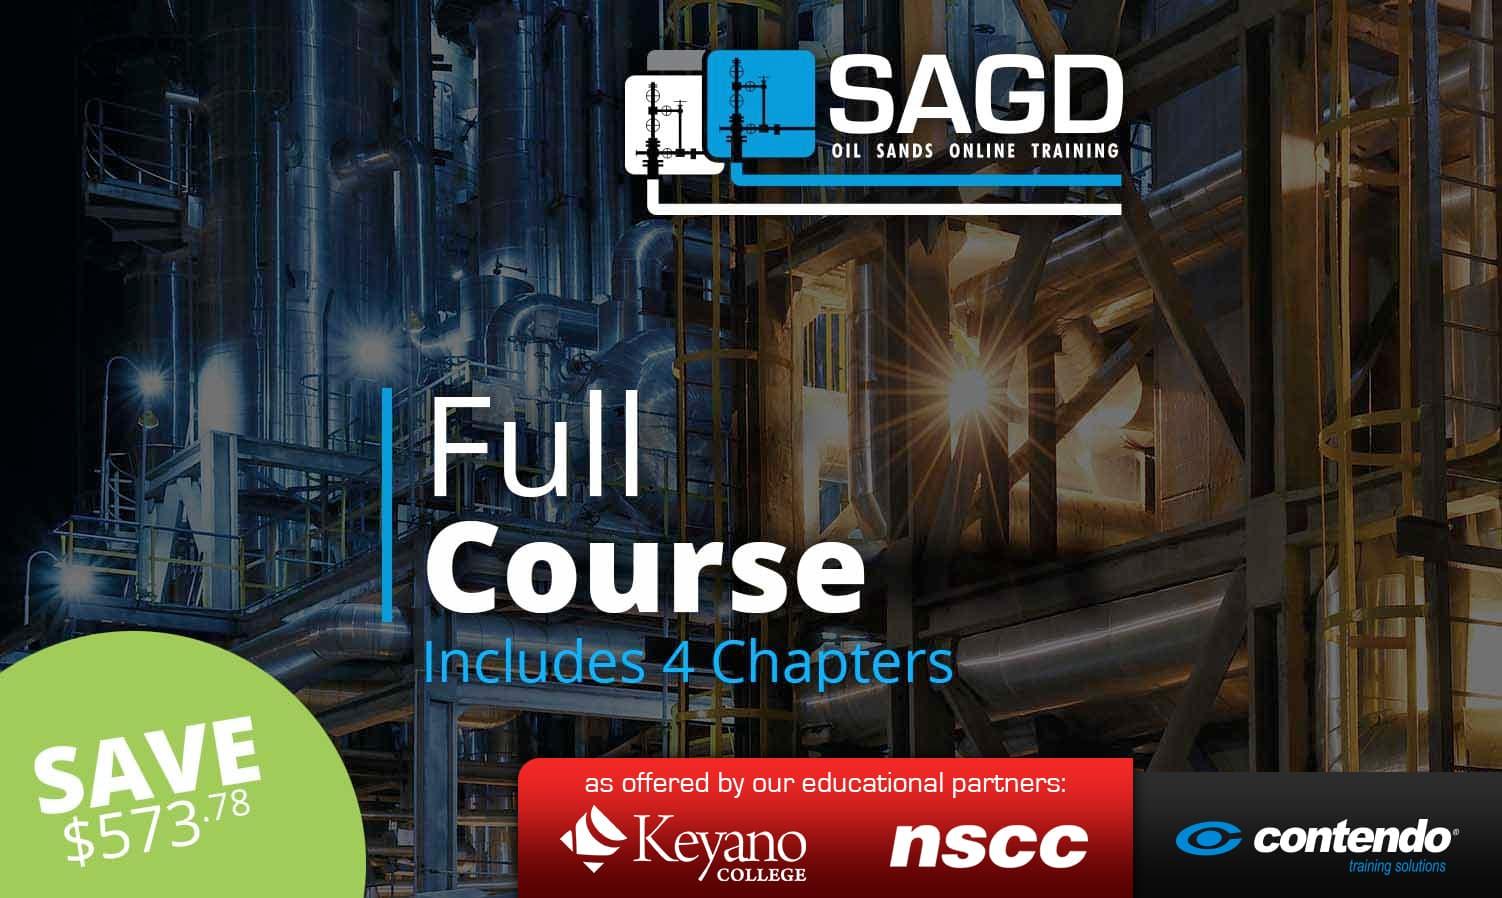 SAGD Oil Sands Training Course